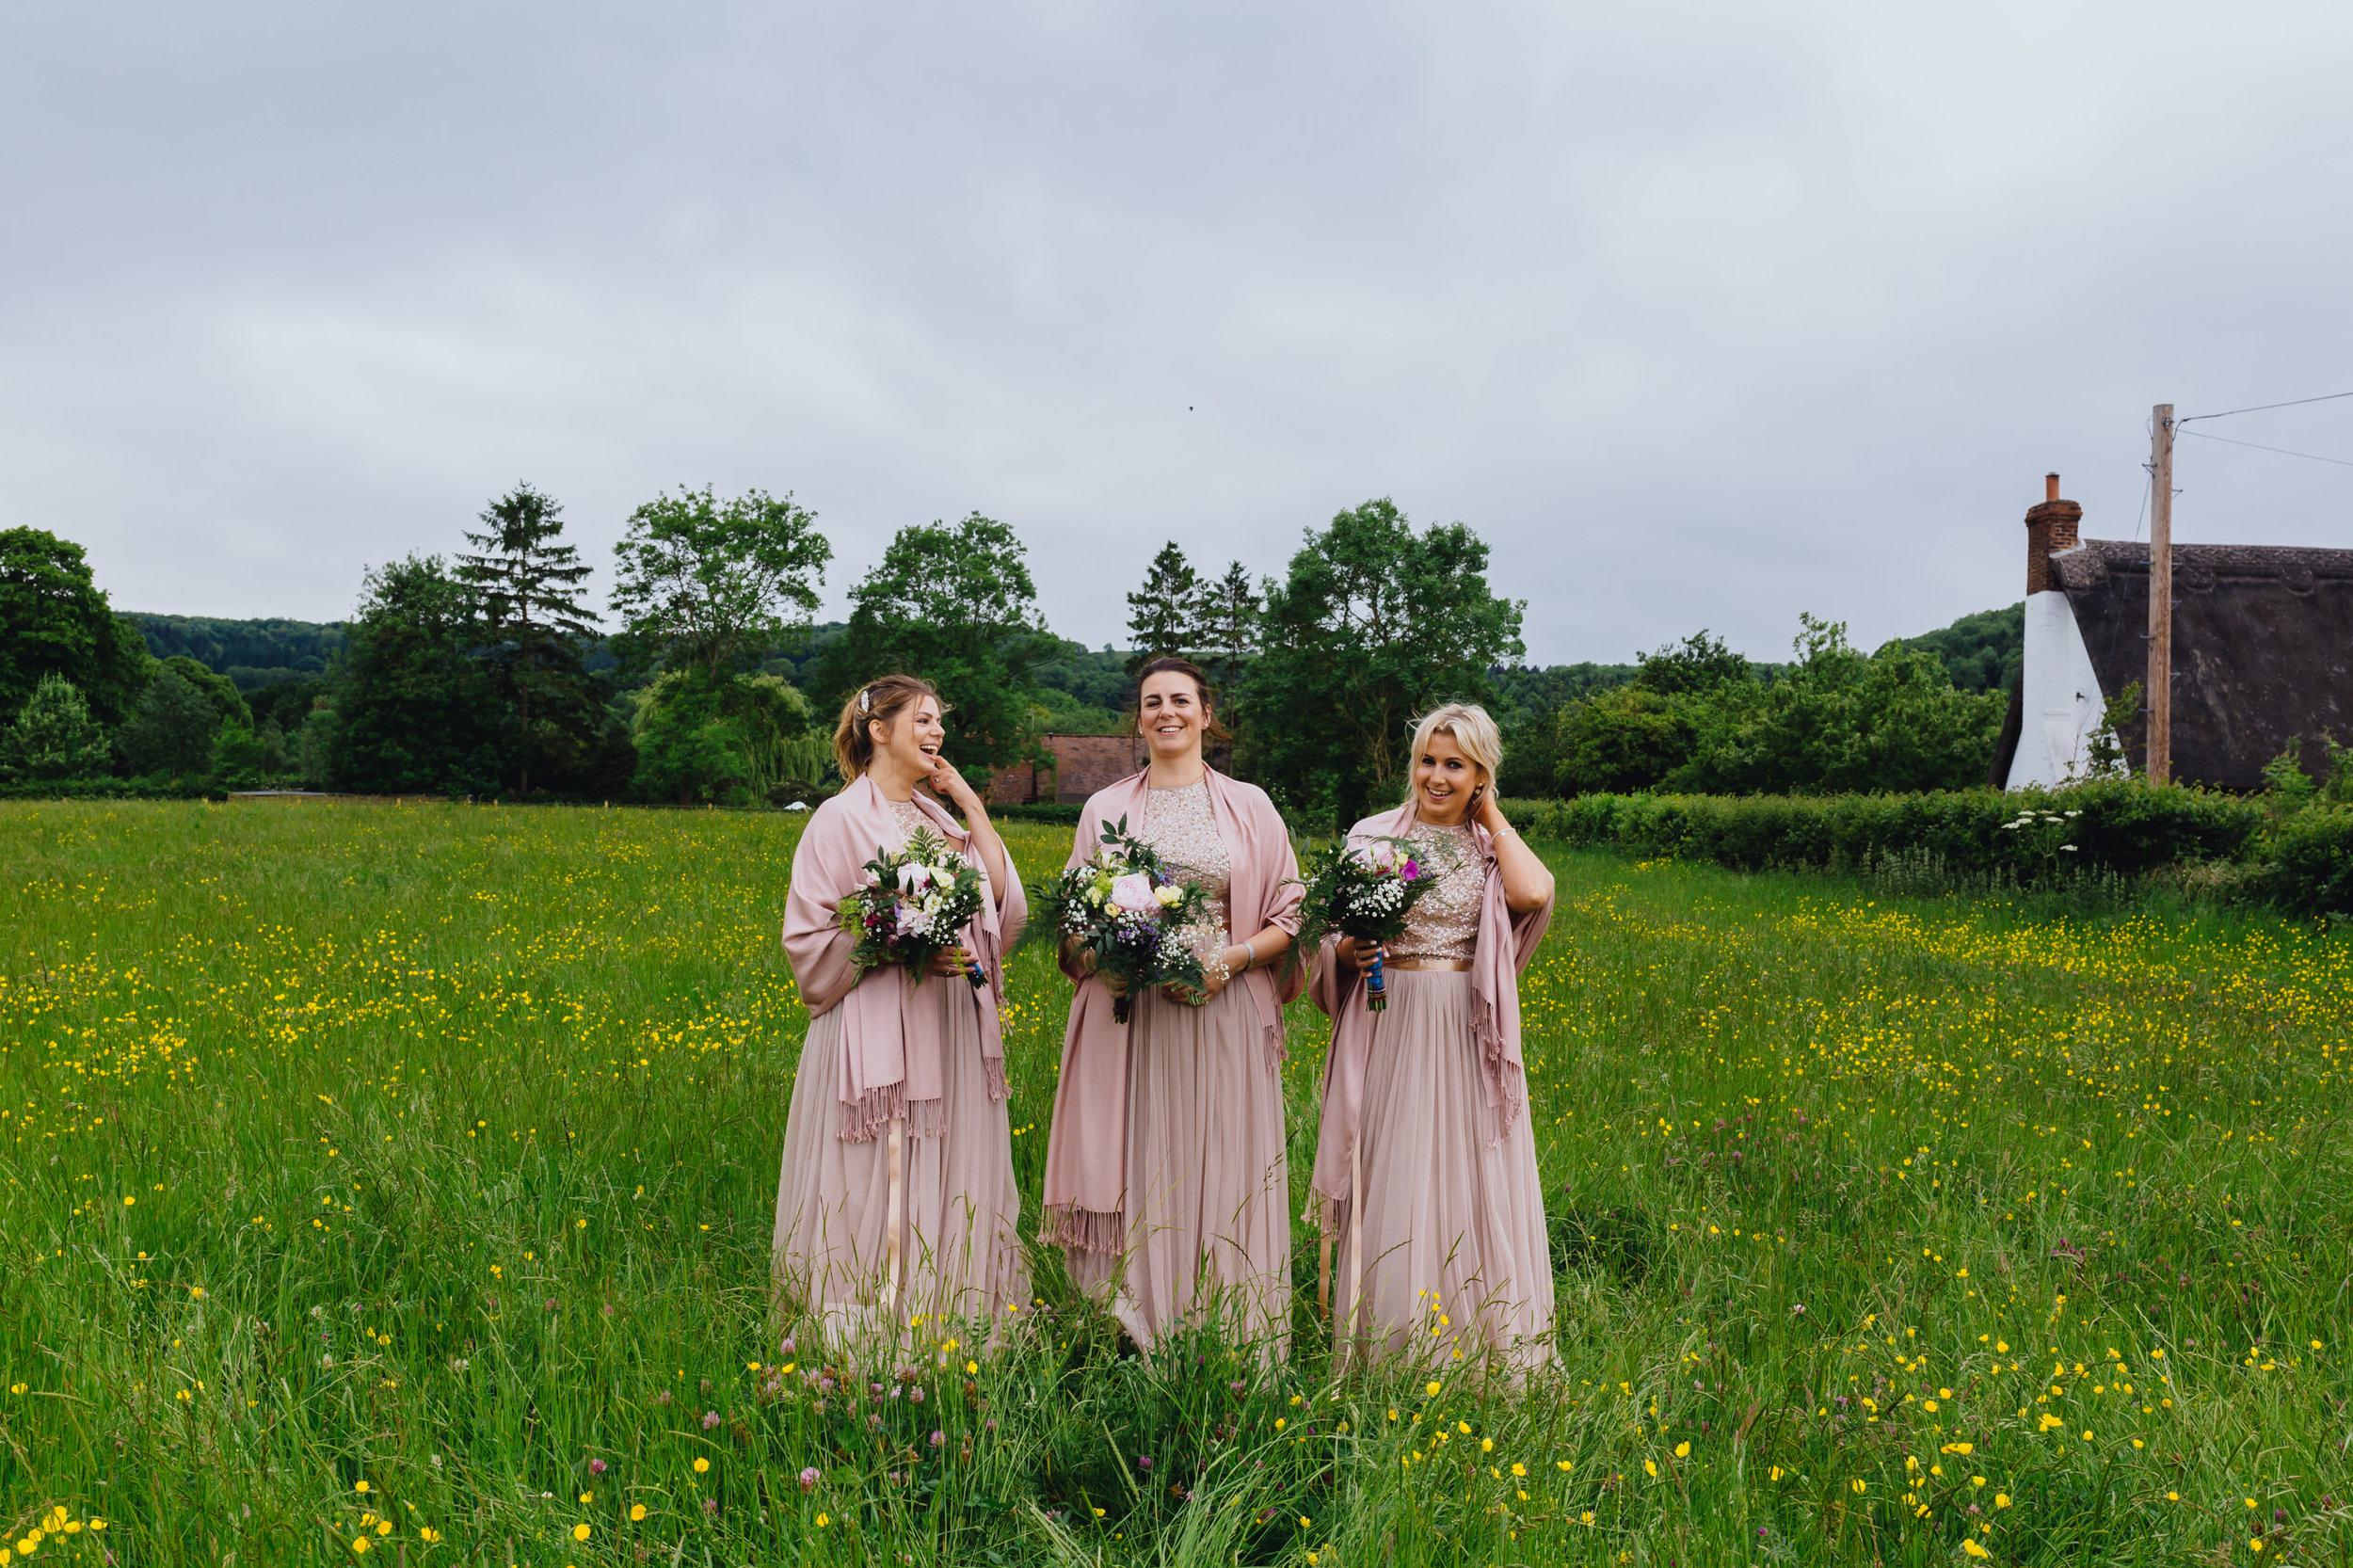 bridesmaids Birmingham photographer wedding country artistic wedding photography28.jpg